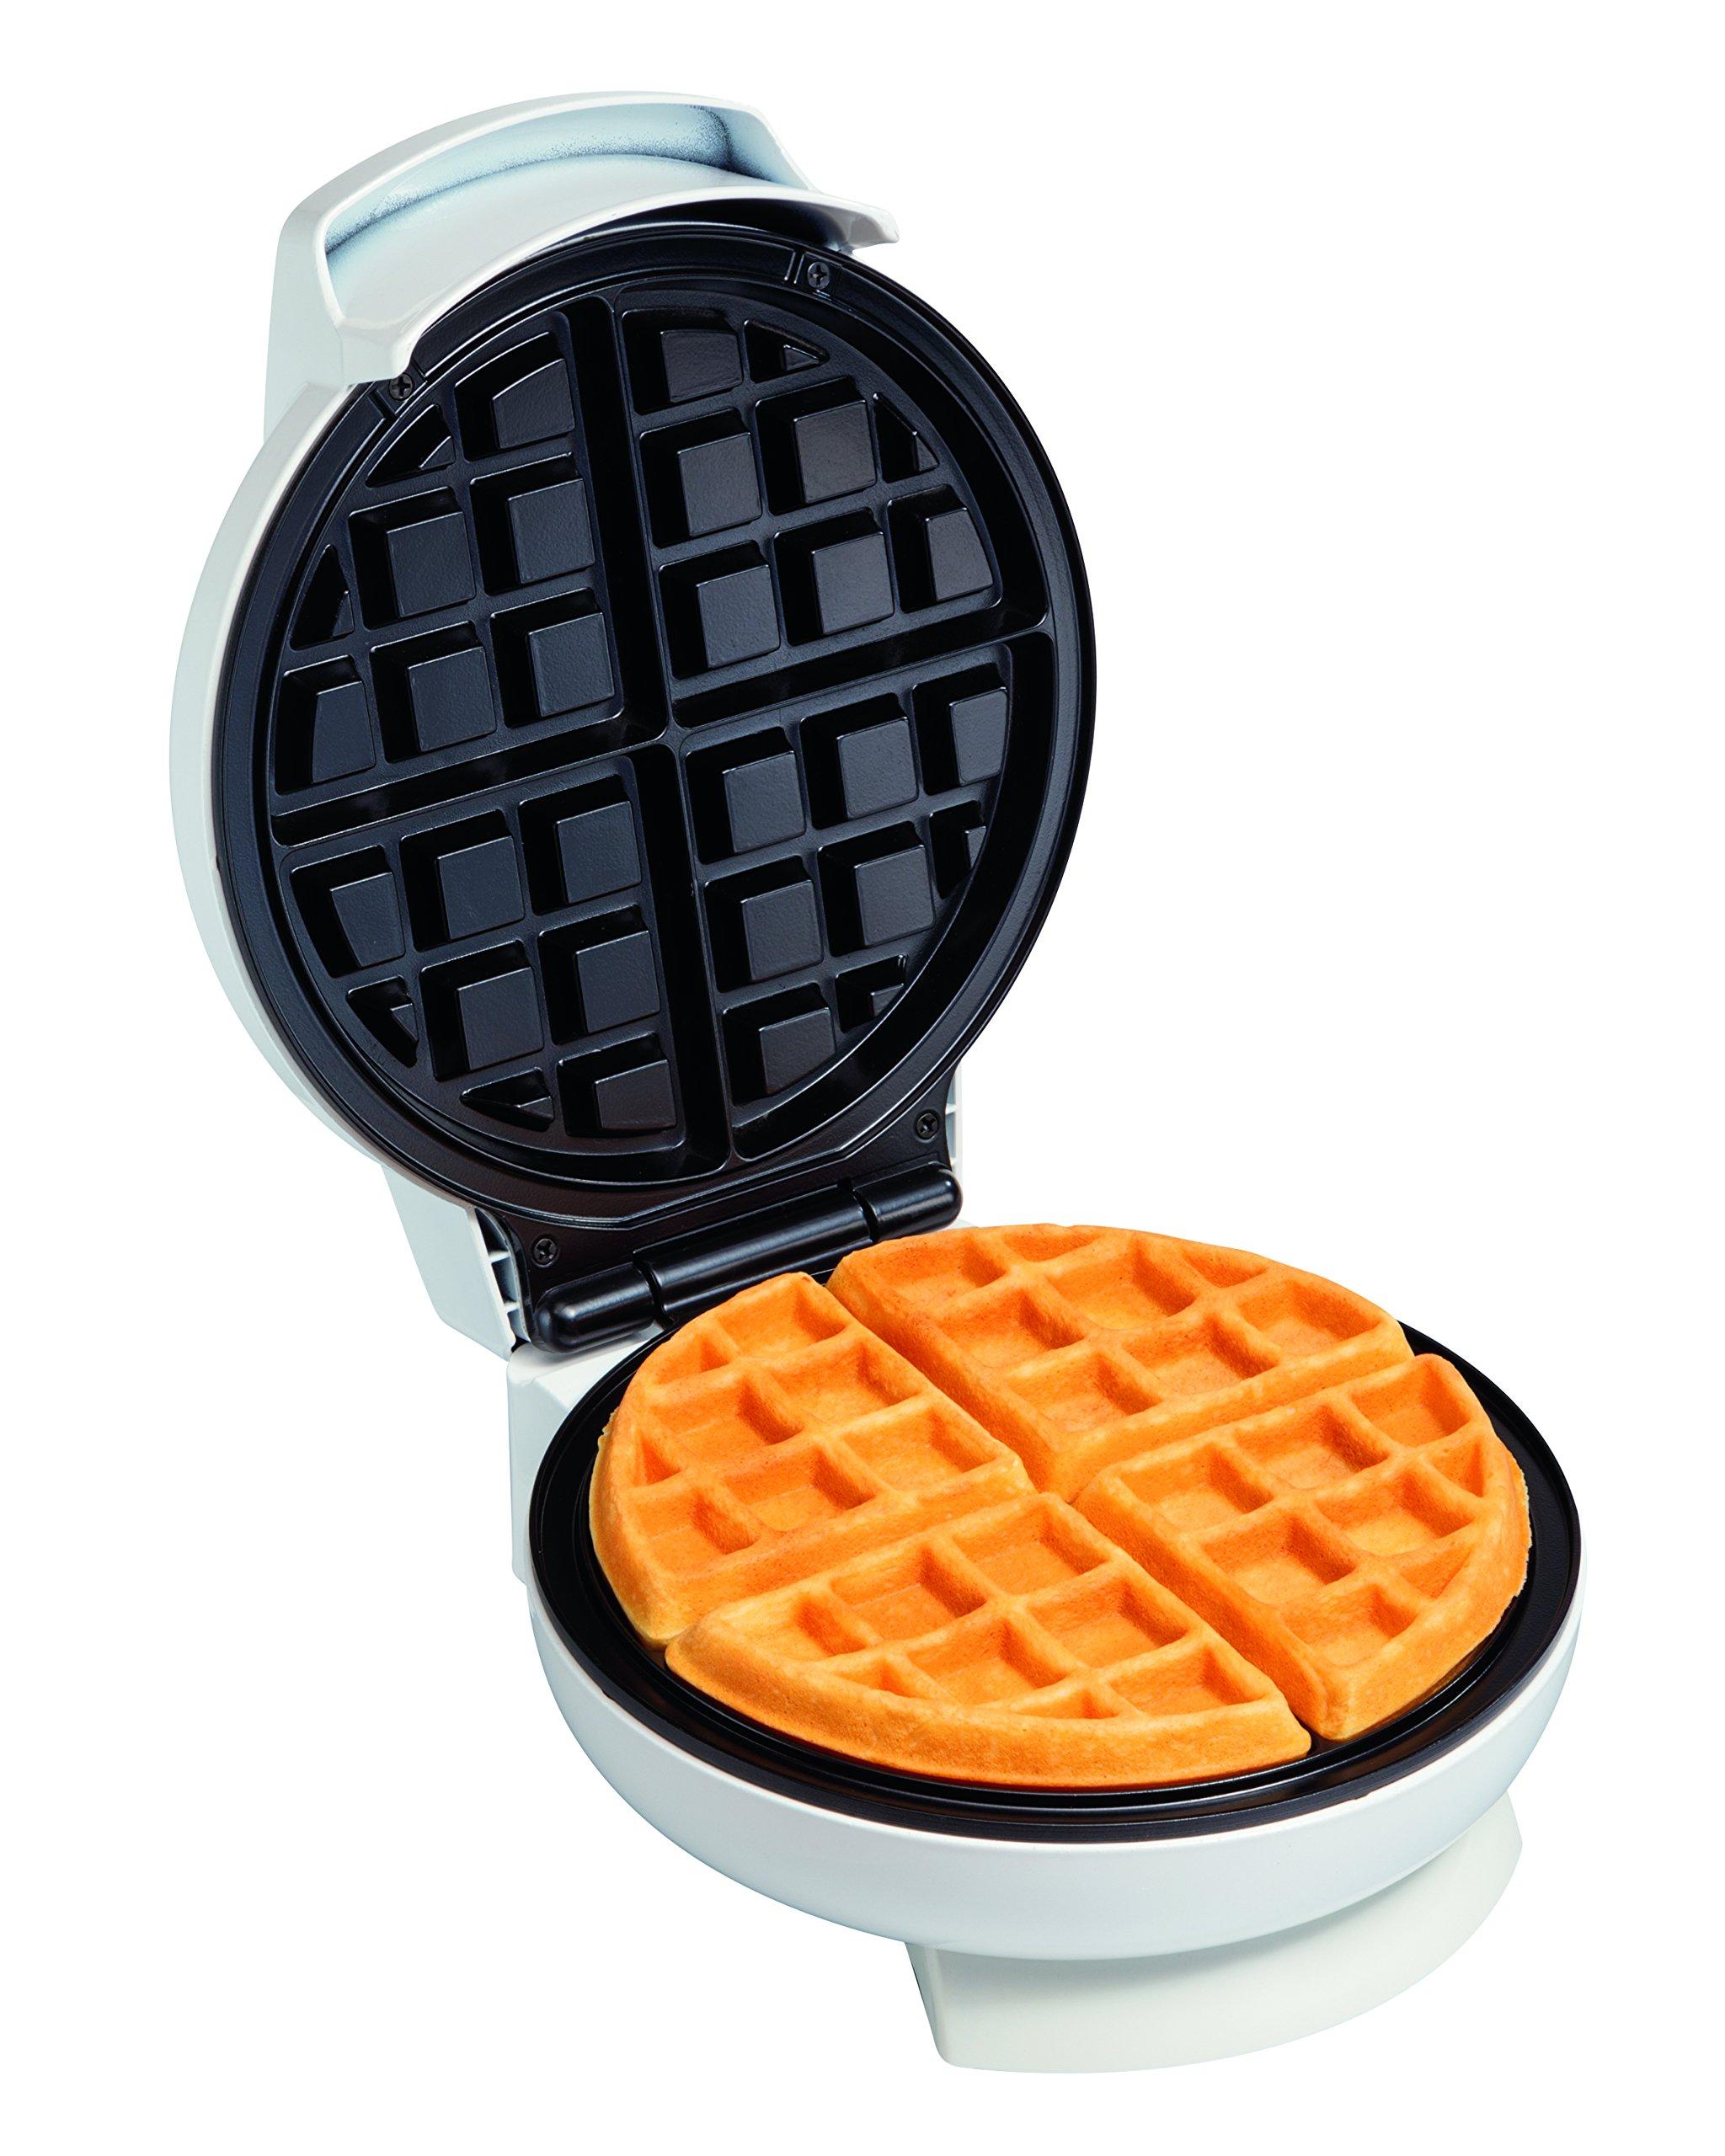 Proctor Silex Belgian Waffle